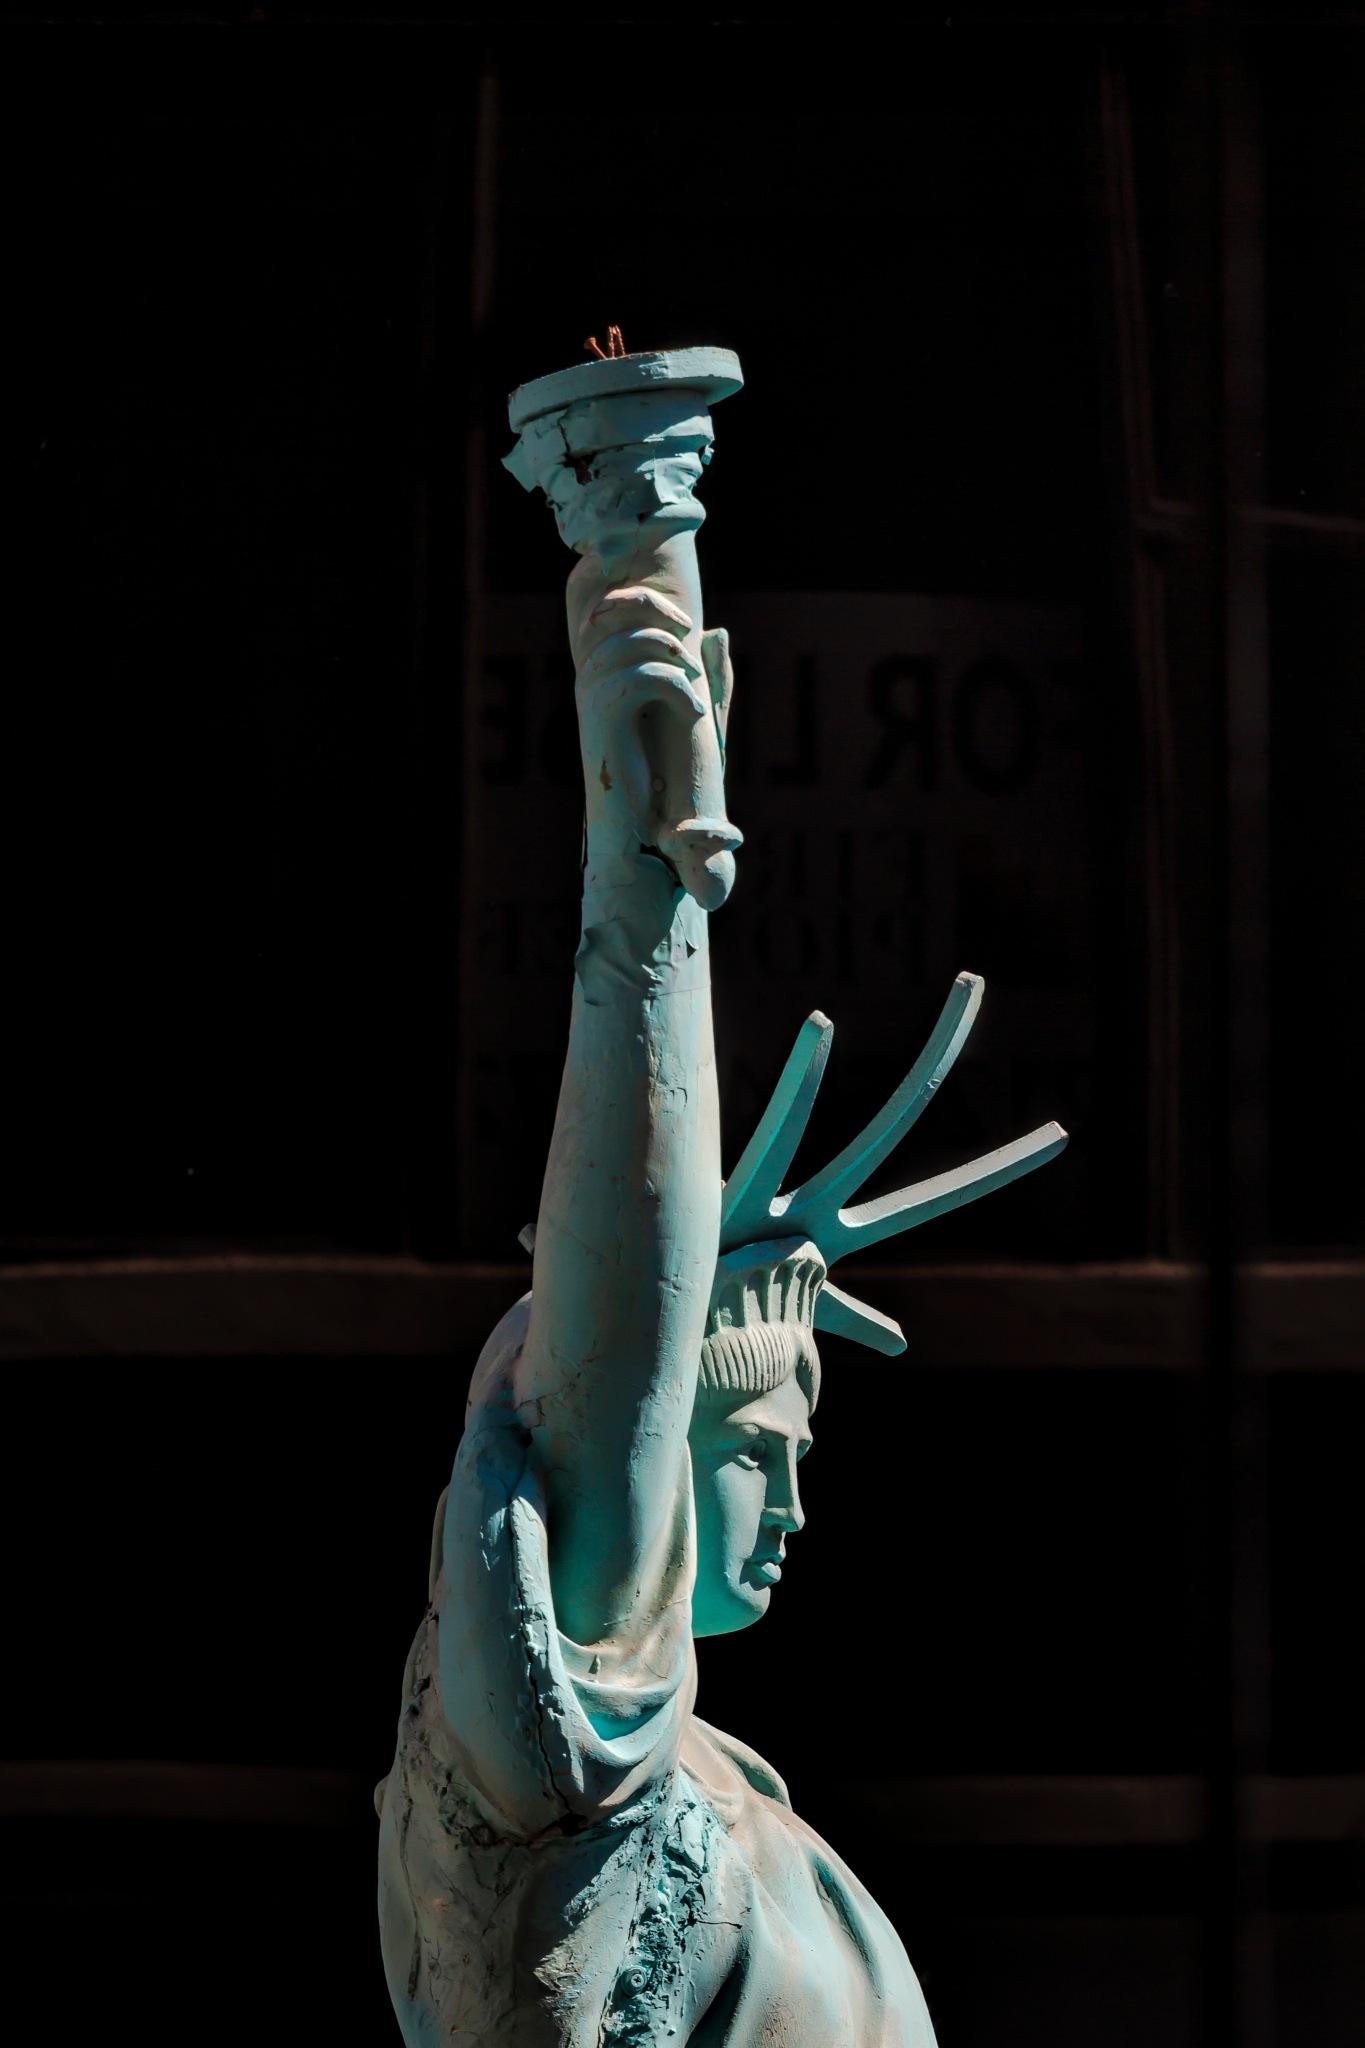 Statue of Liberty Replica by robertullmann